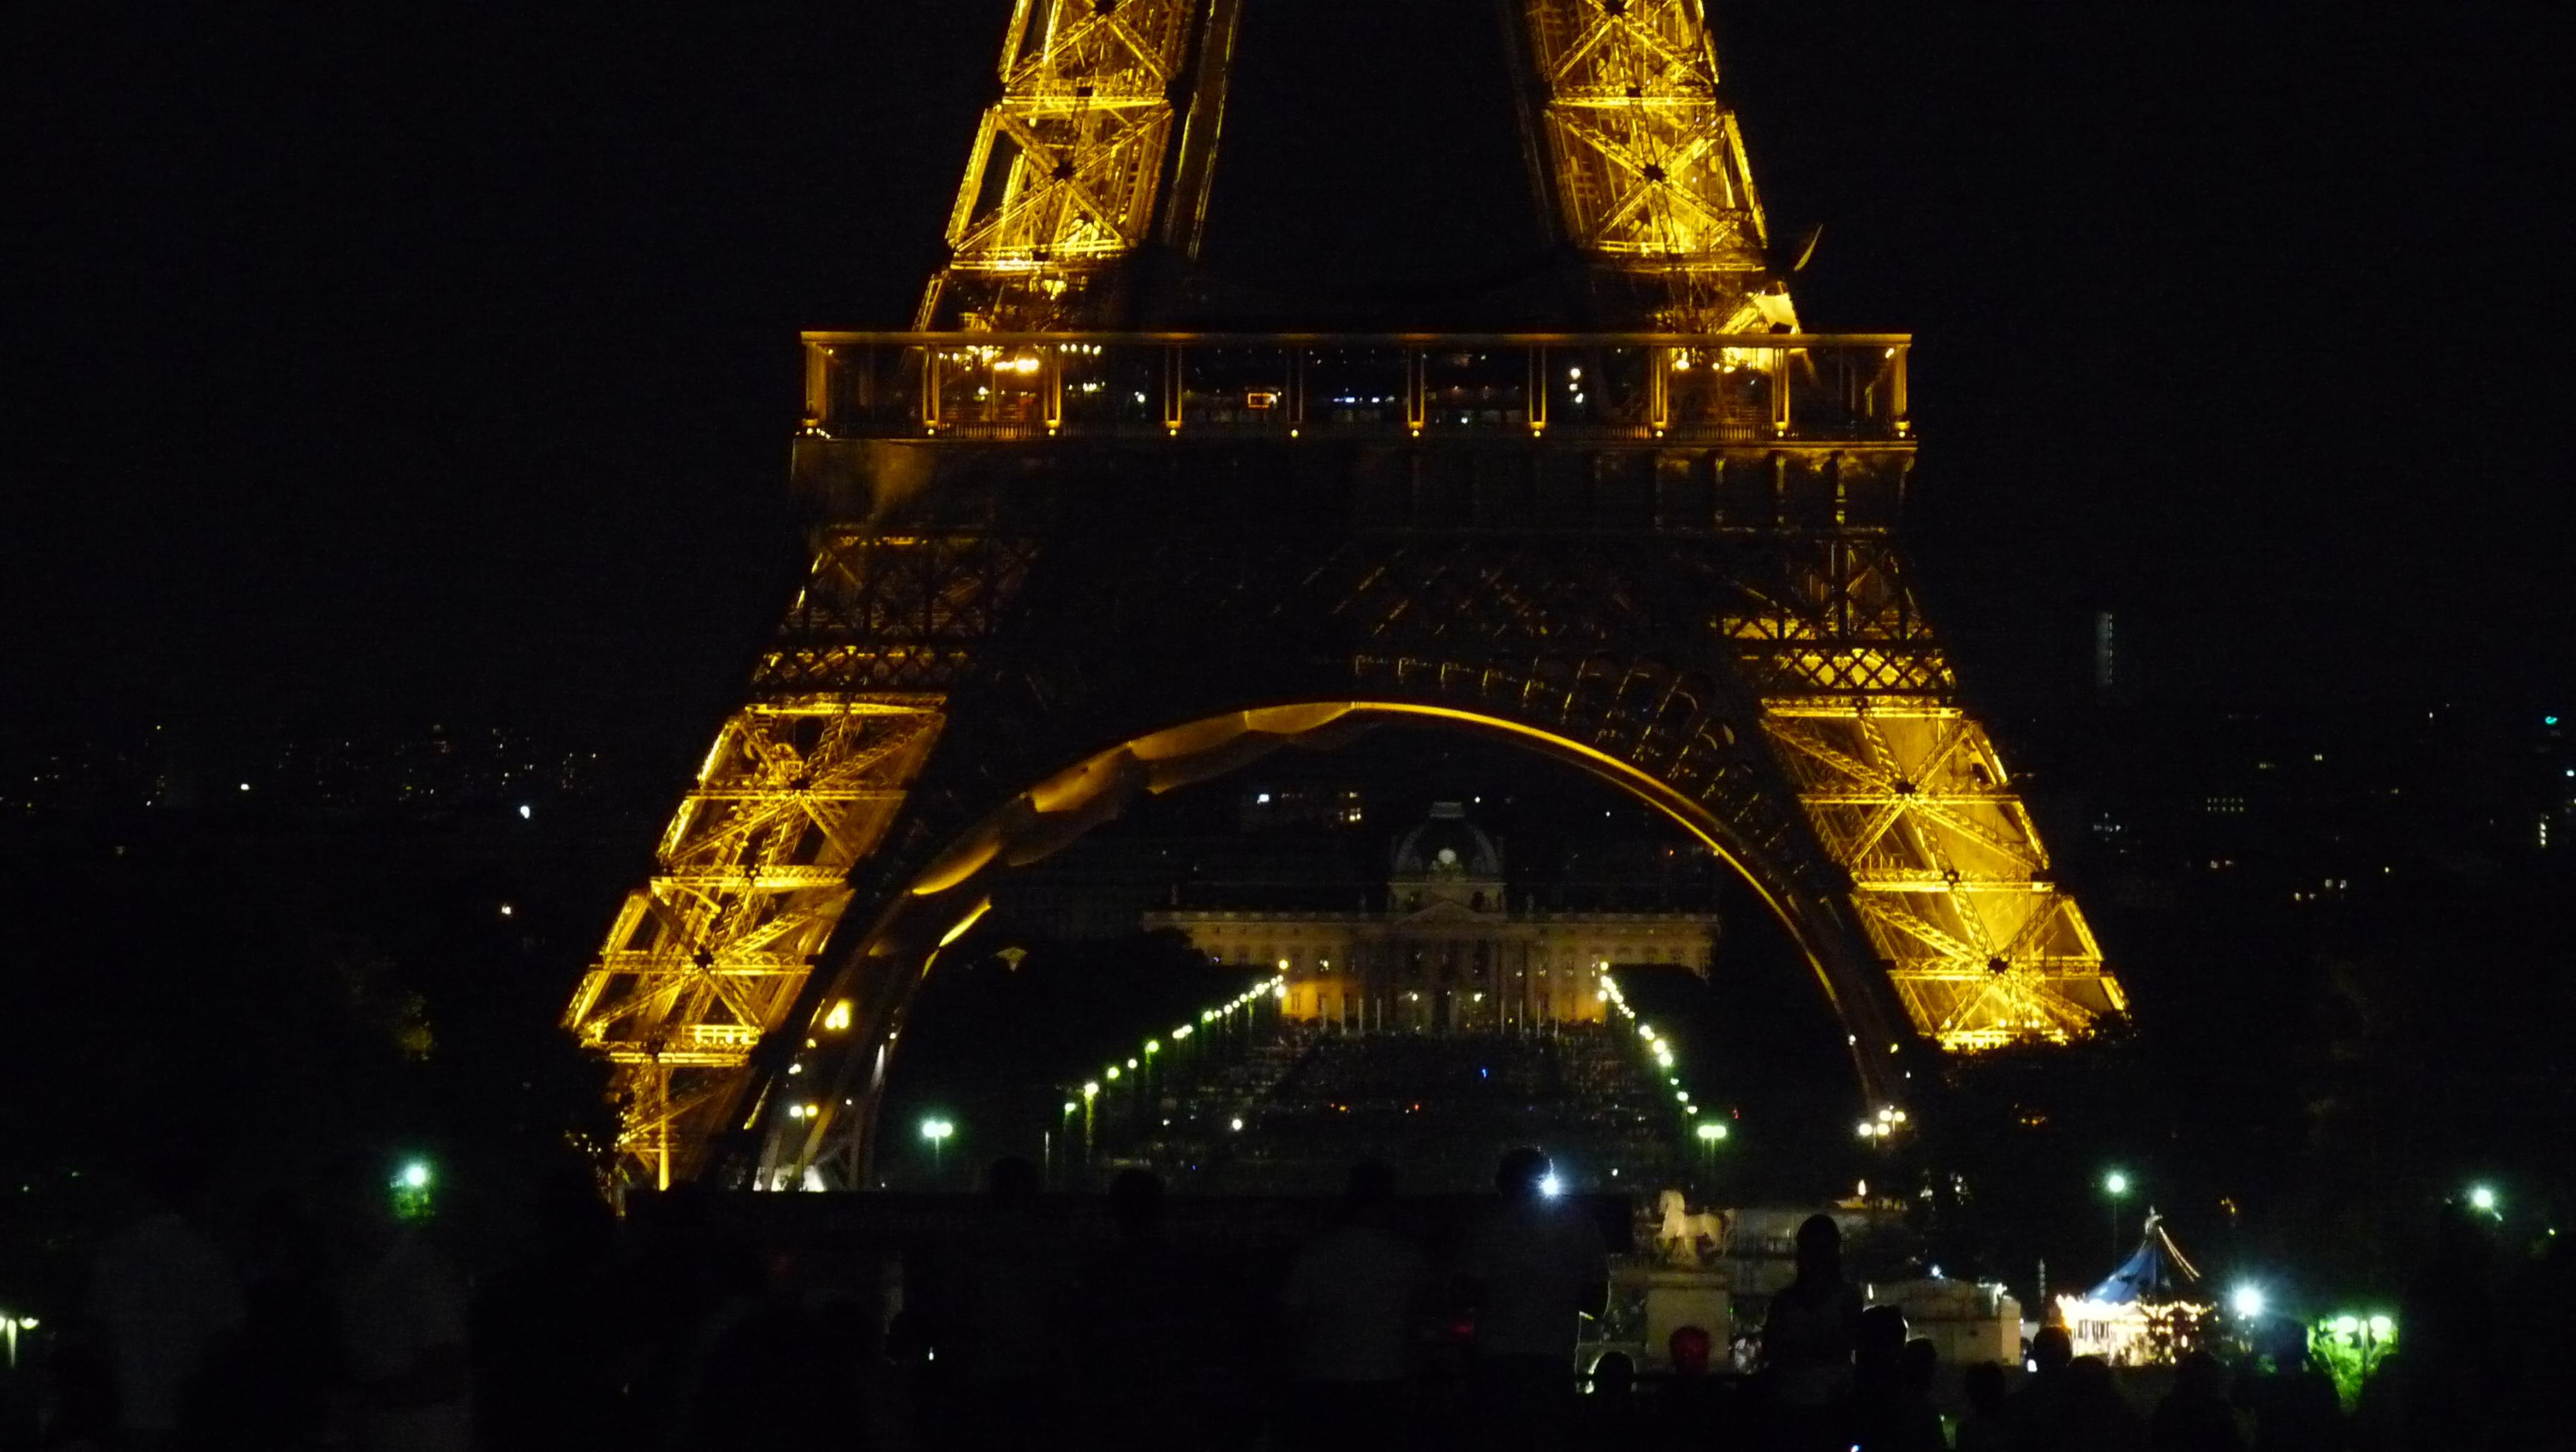 [2010-06-05] La Tour Eiffel «by night»